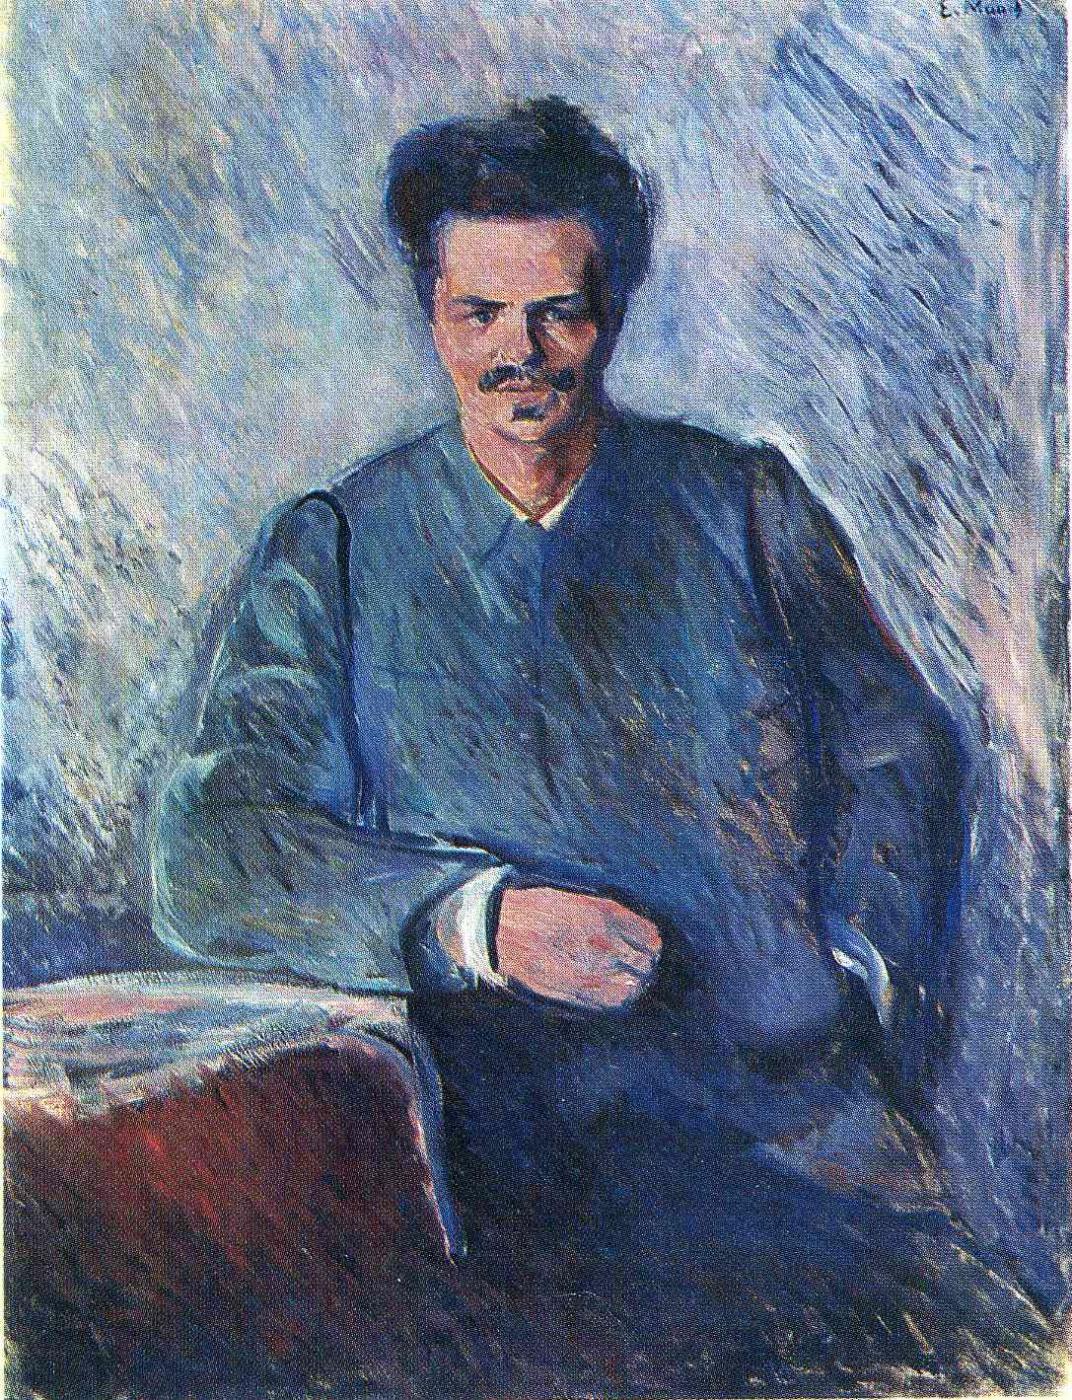 Edward Munch. August Strindberg